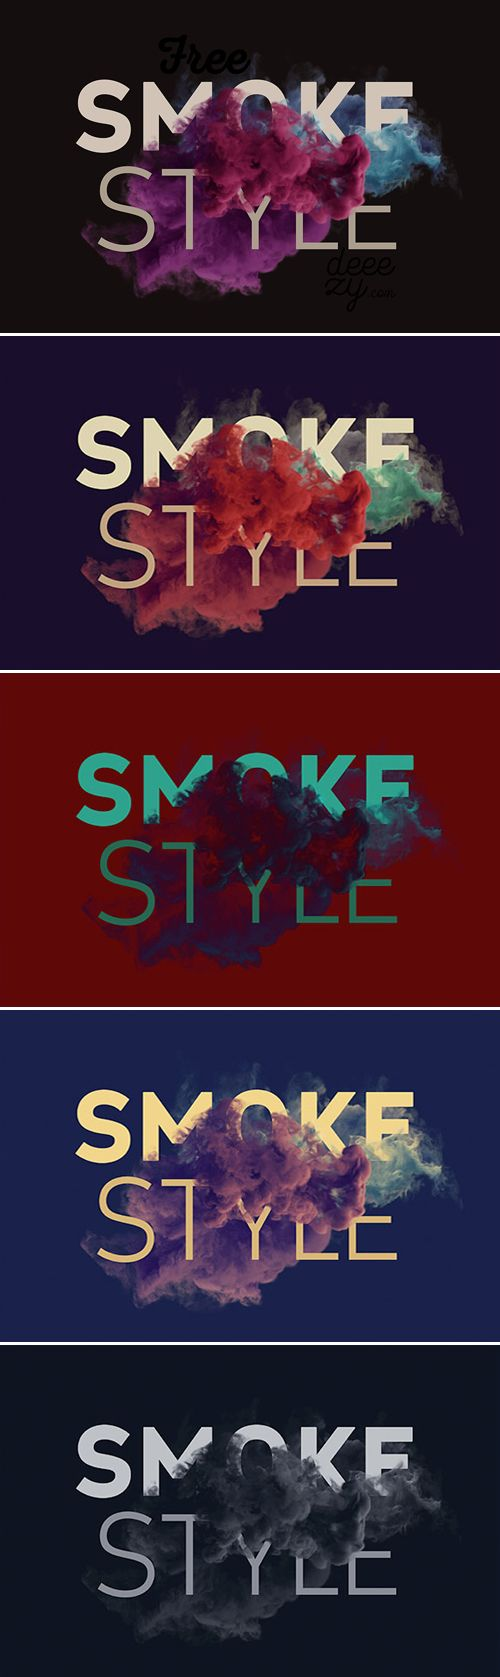 PSD Mock-Up - Smoke Scene PSD